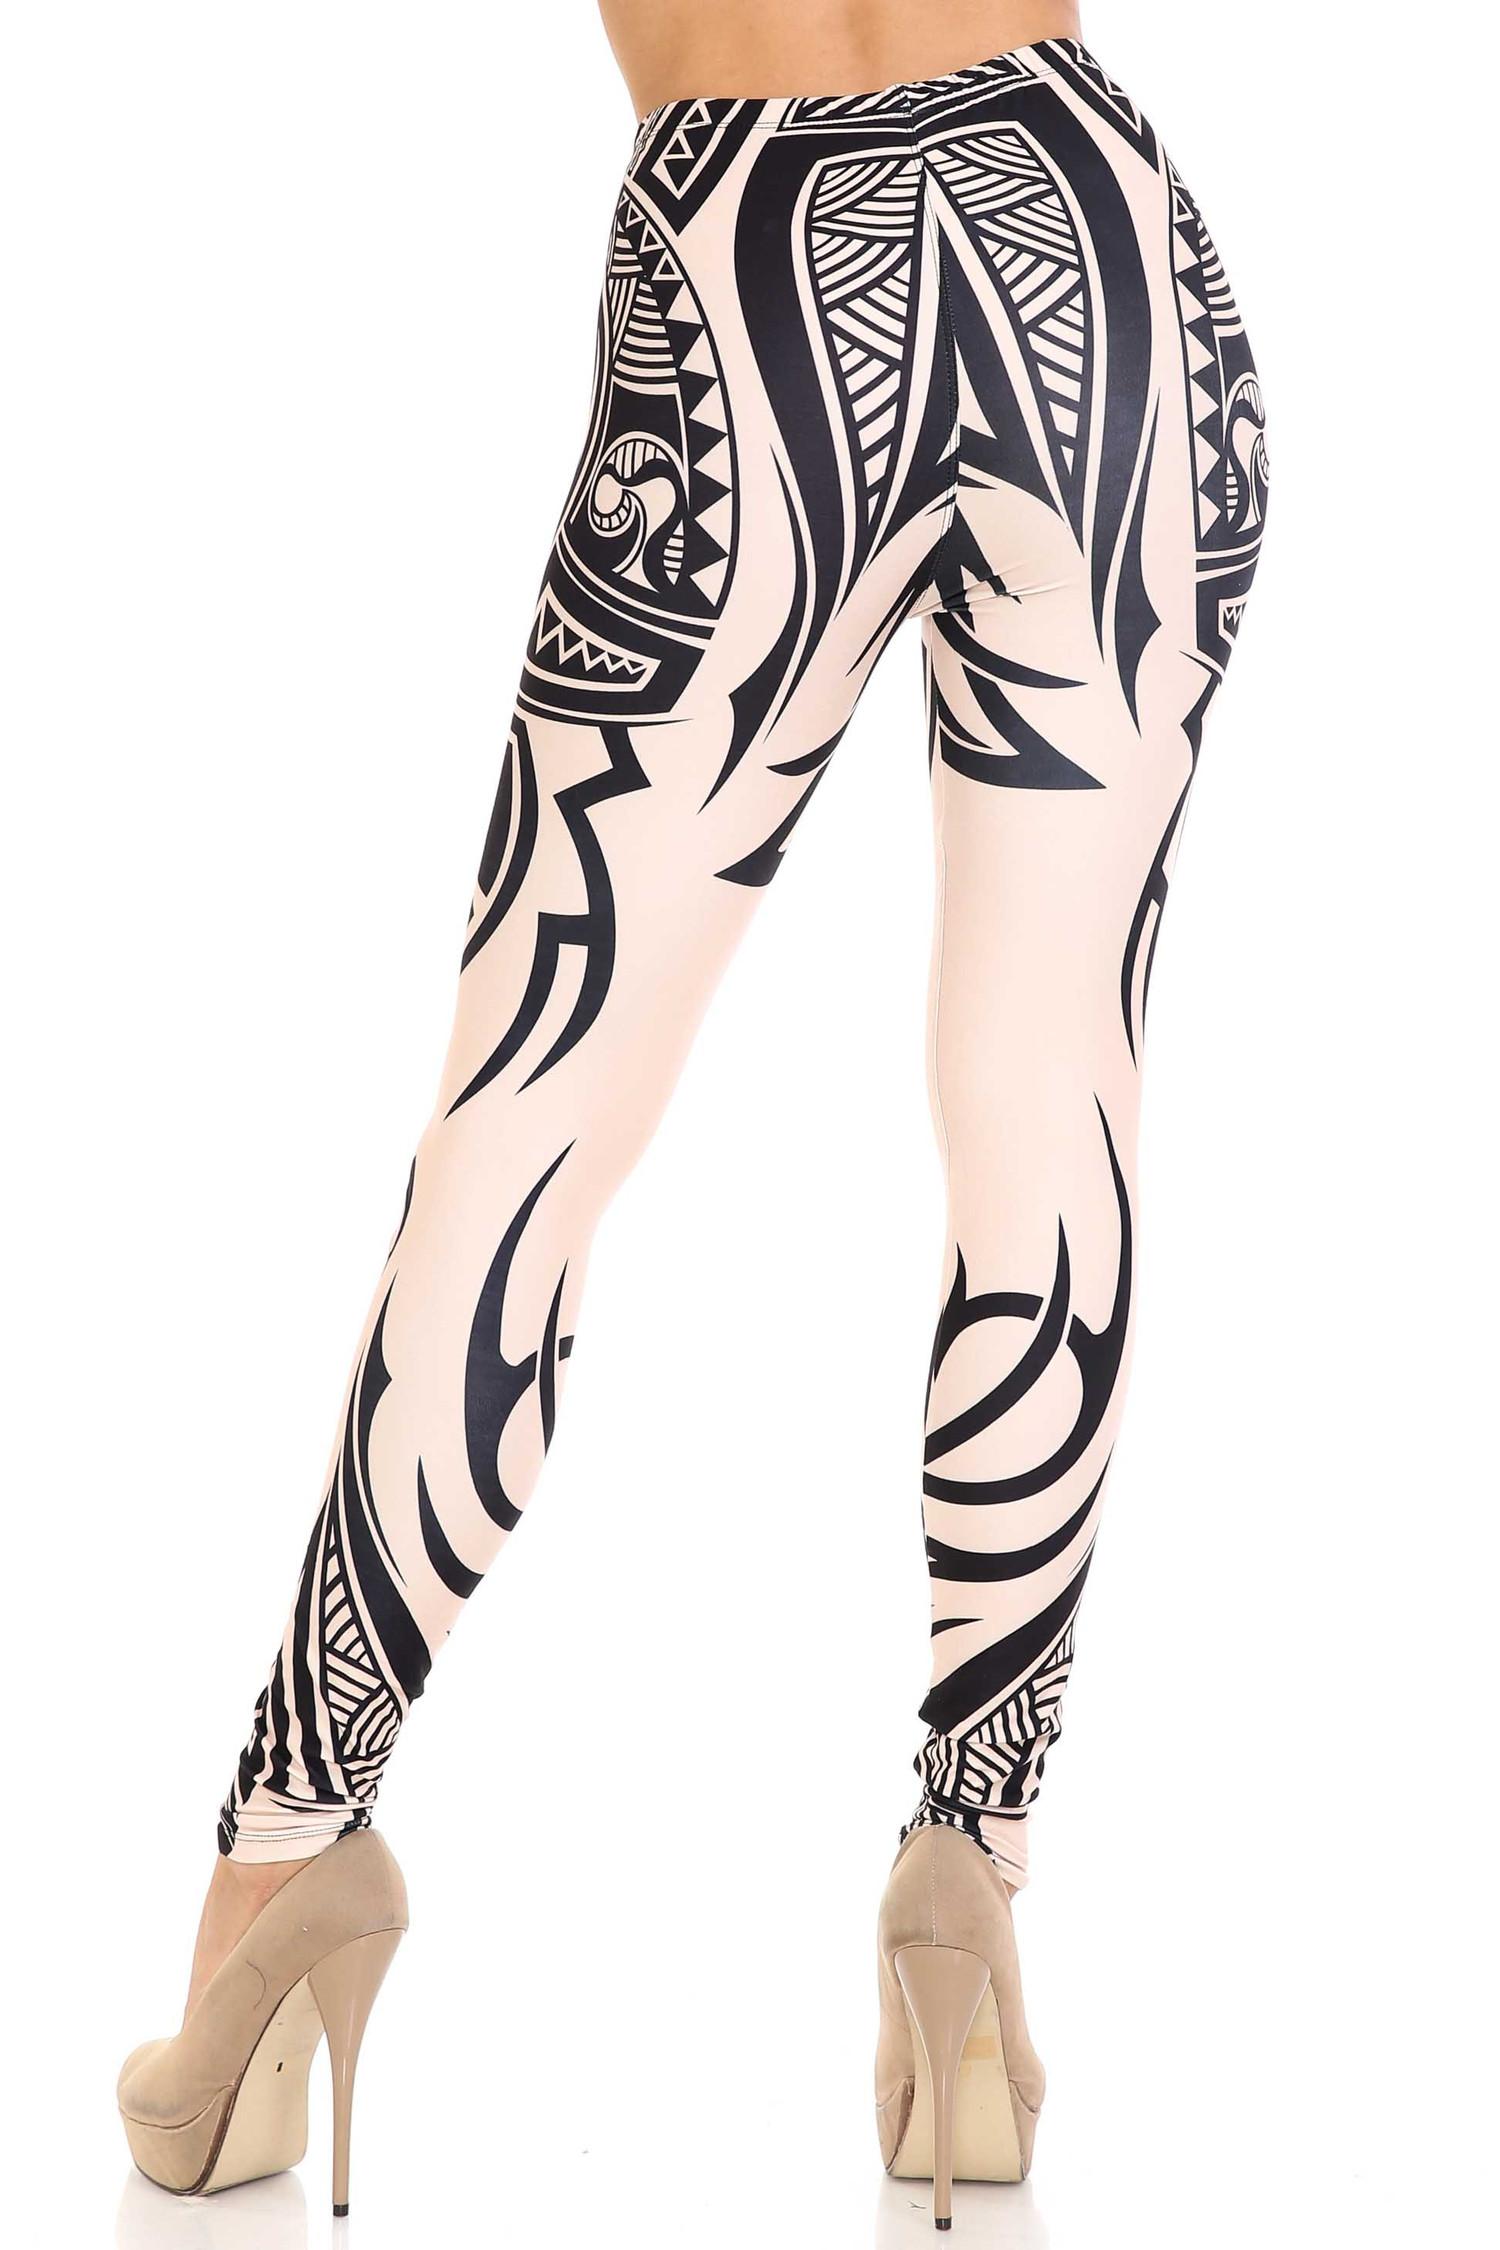 Creamy Soft Celestial Tribal Leggings - USA Fashion™